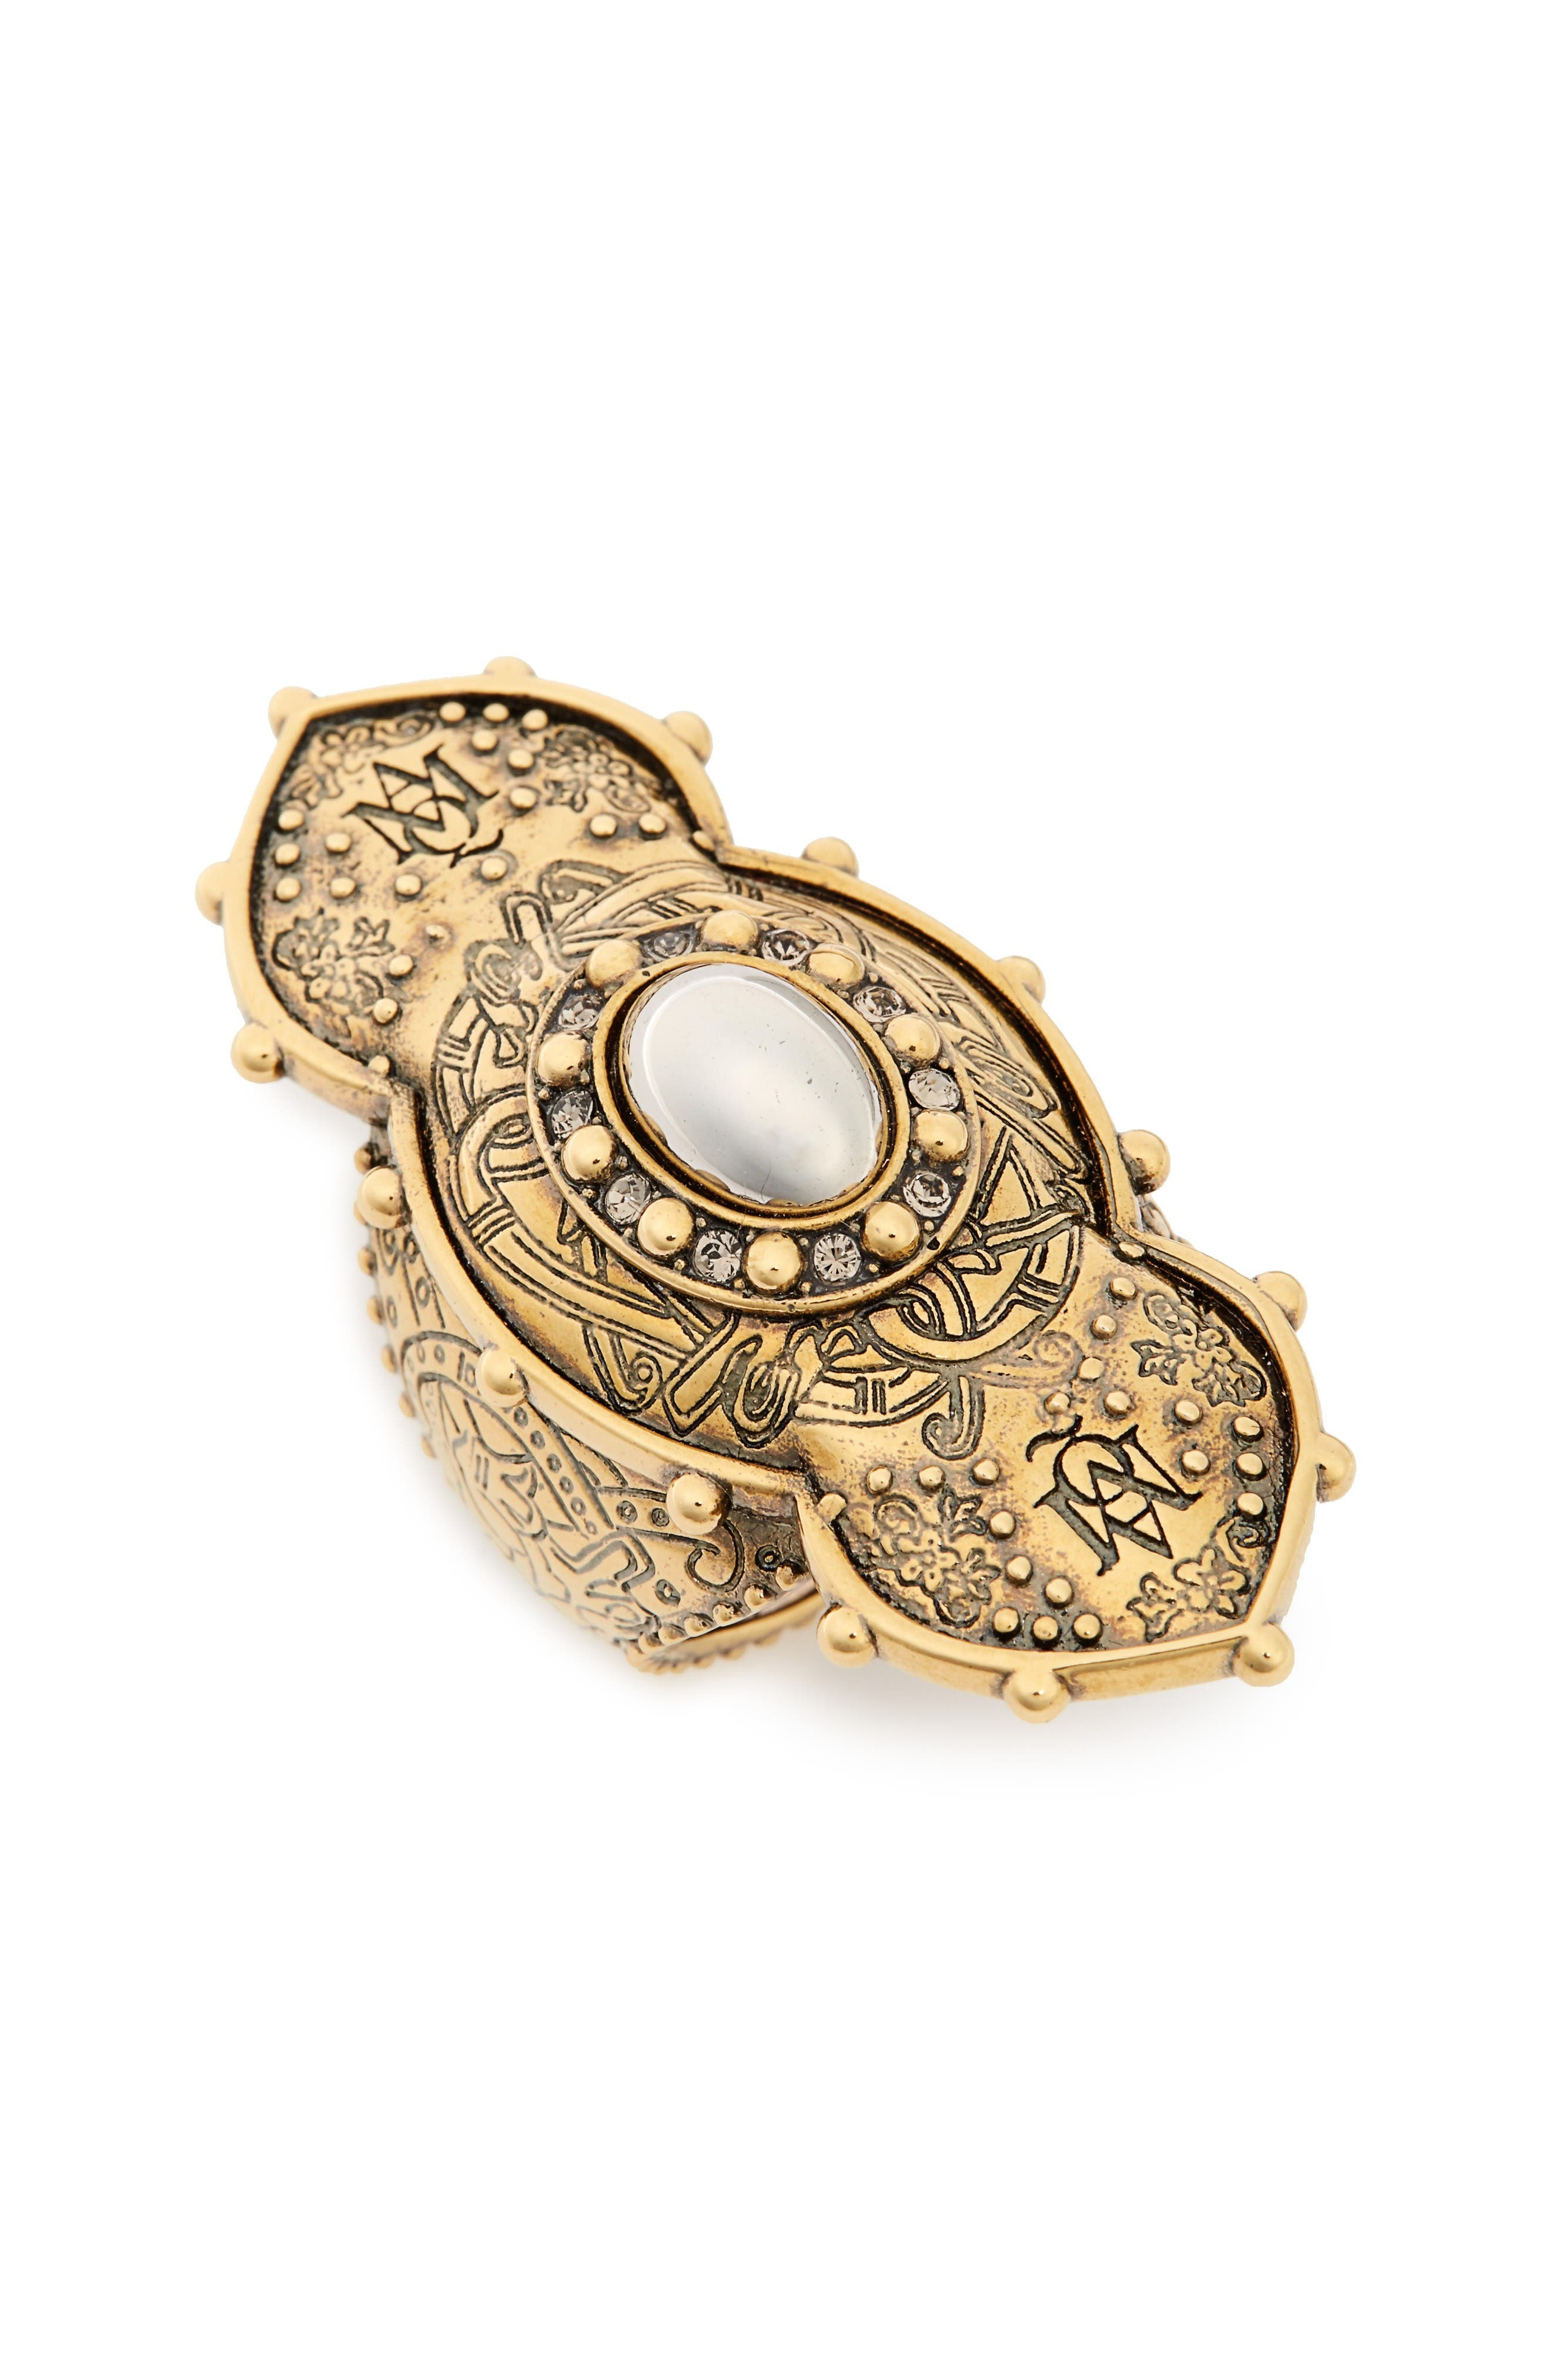 Alternate Image 1 Selected - Alexander McQueen Jewel Oval Ring